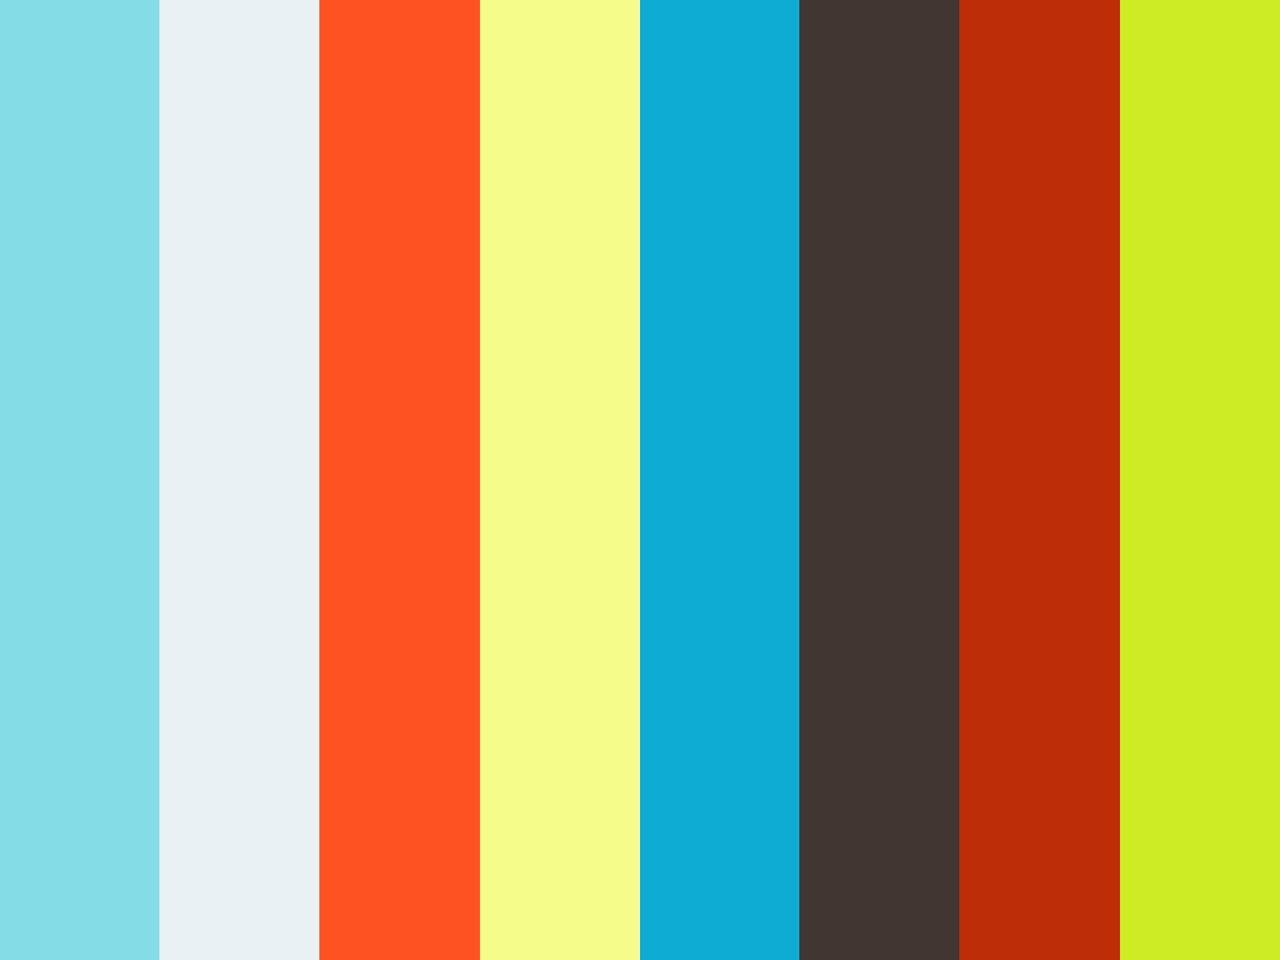 171105 CARONNESE-CHIERI 0-0 - INT MONZA